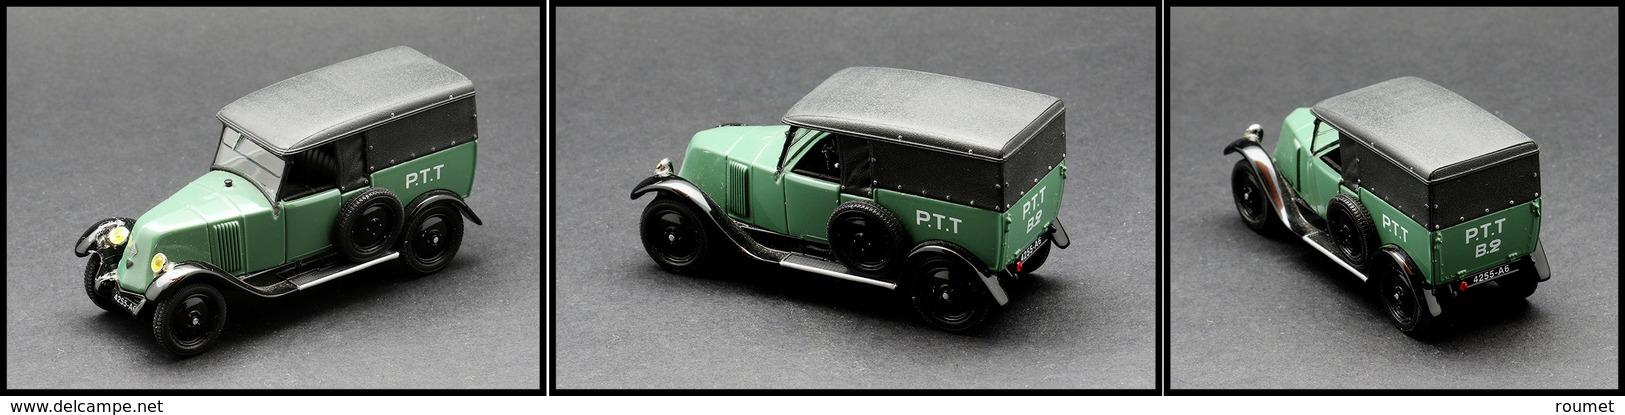 "Voiture ""Renault NN 1927"", éd. Universal Hobbies. - TB - Boites A Timbres"